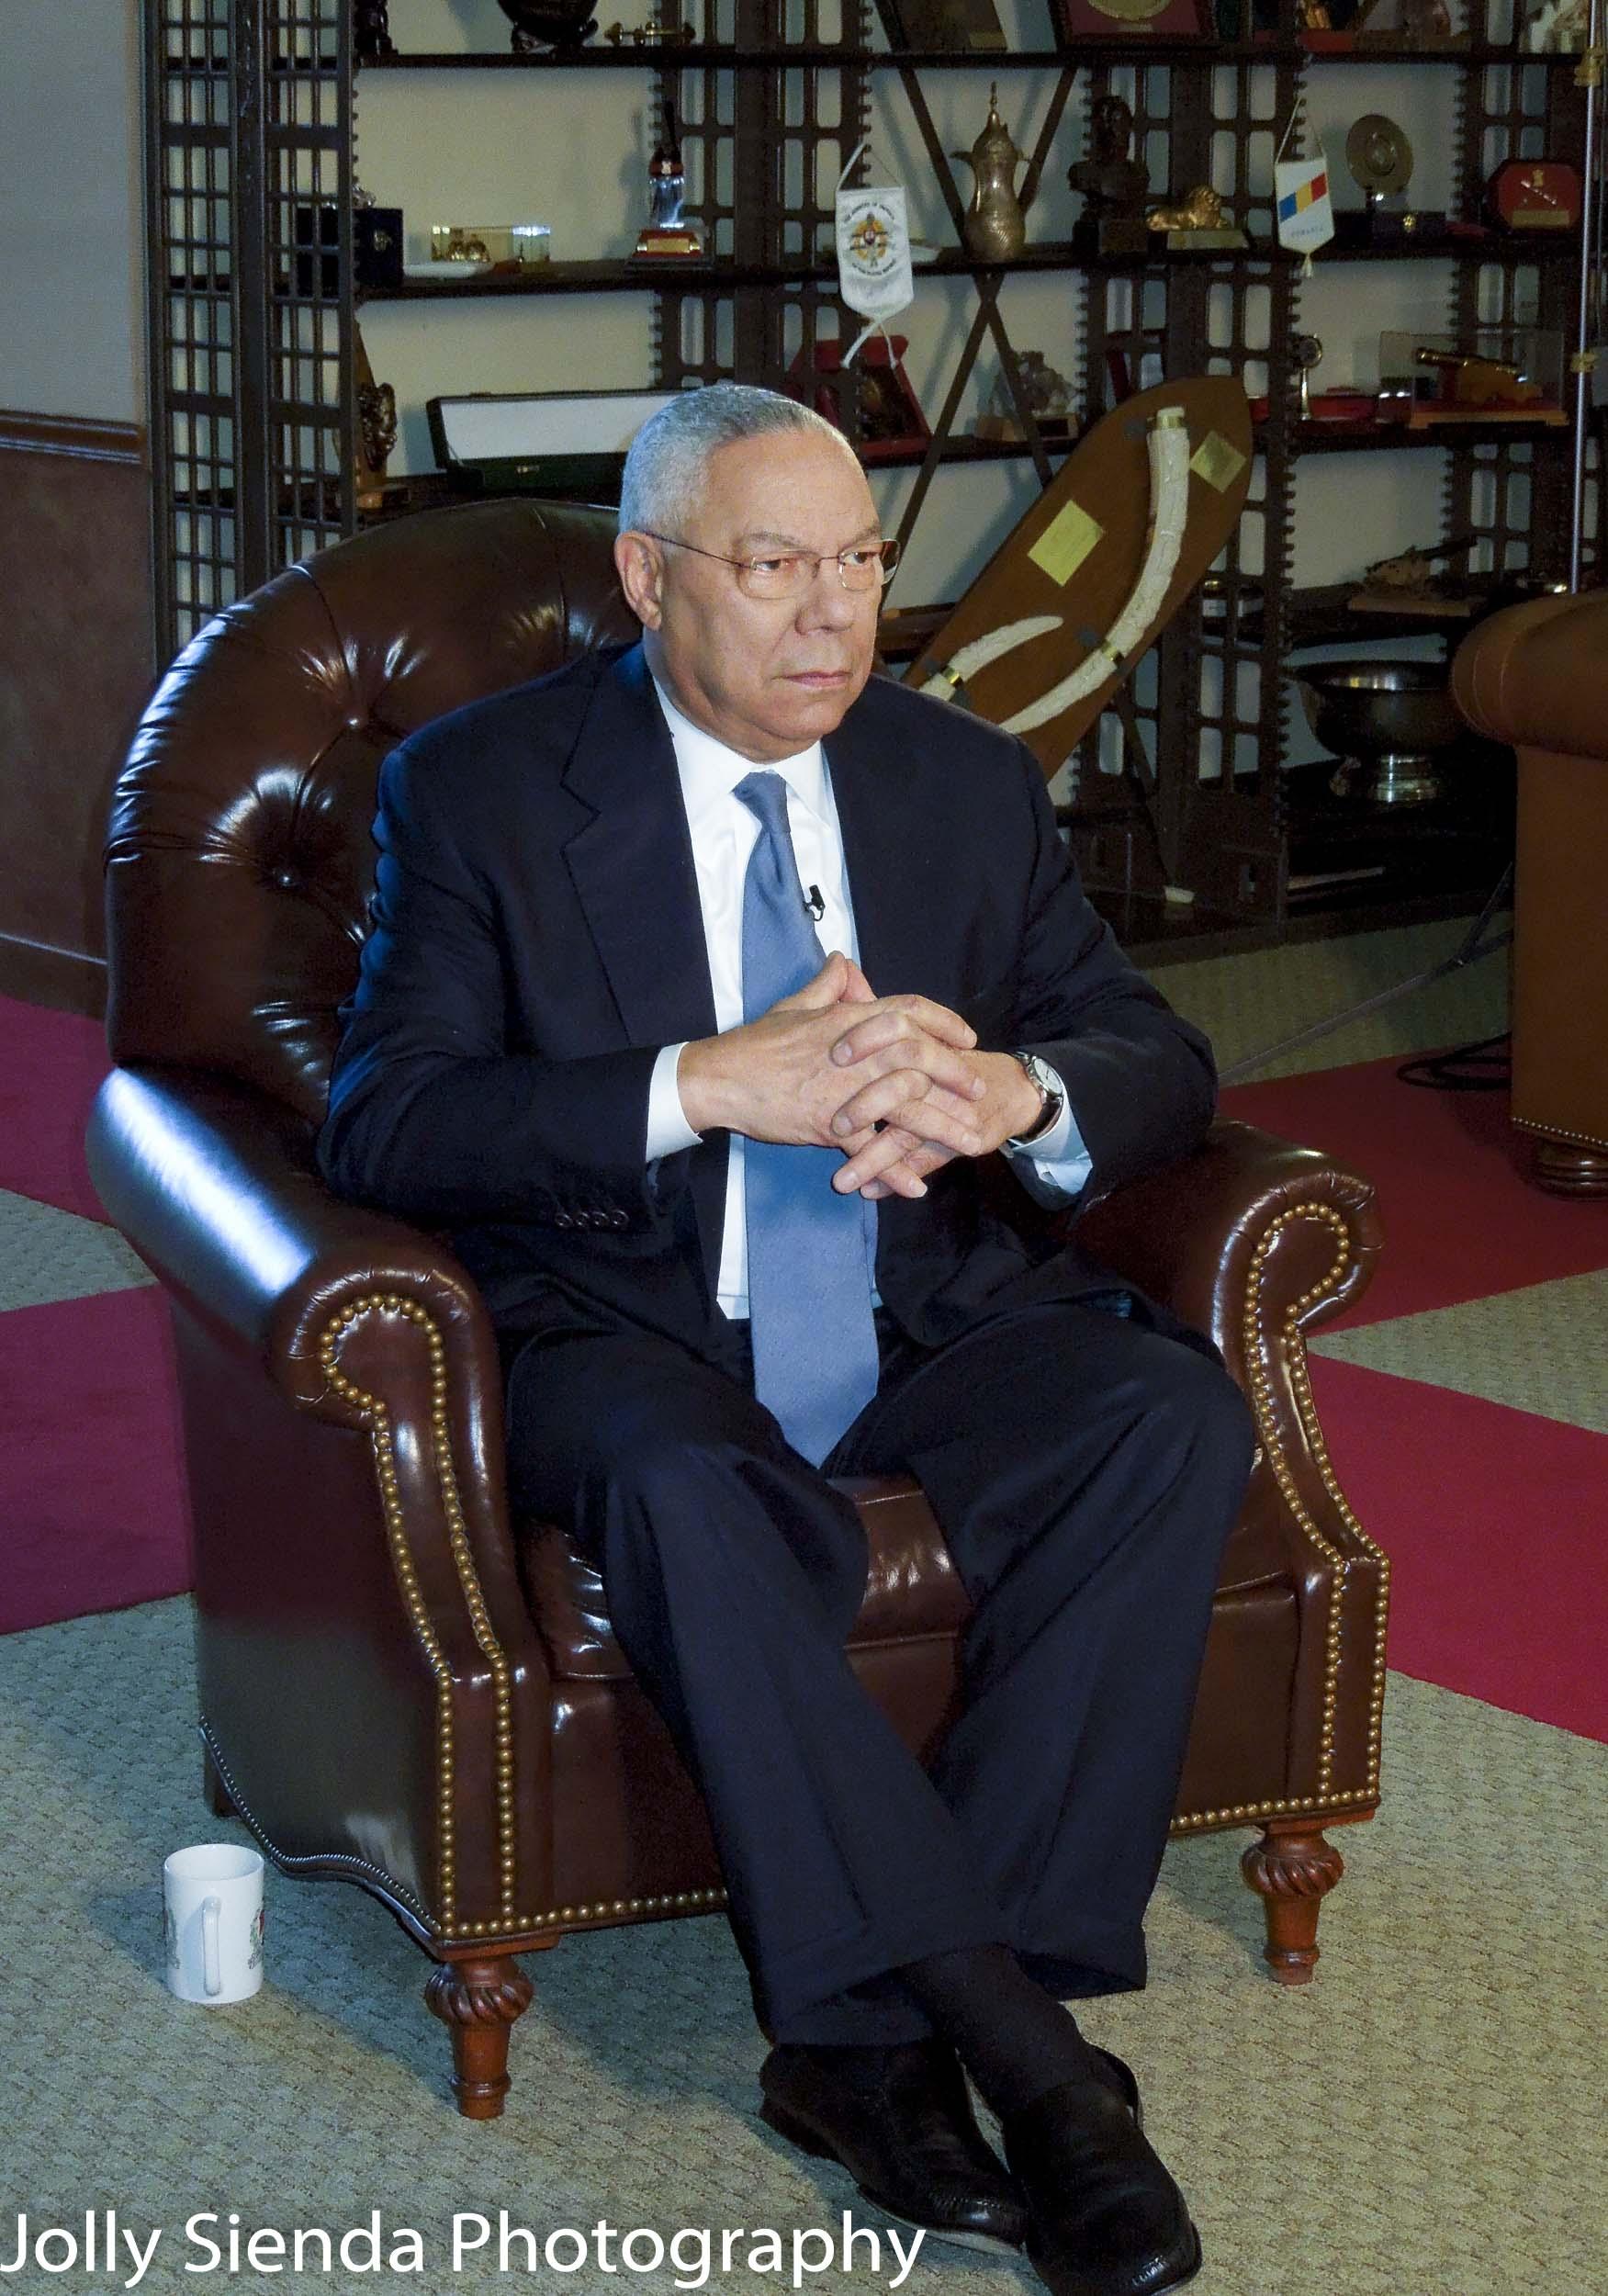 Colin Powell, (Ret) U.S. Secretary of State, four-star general U